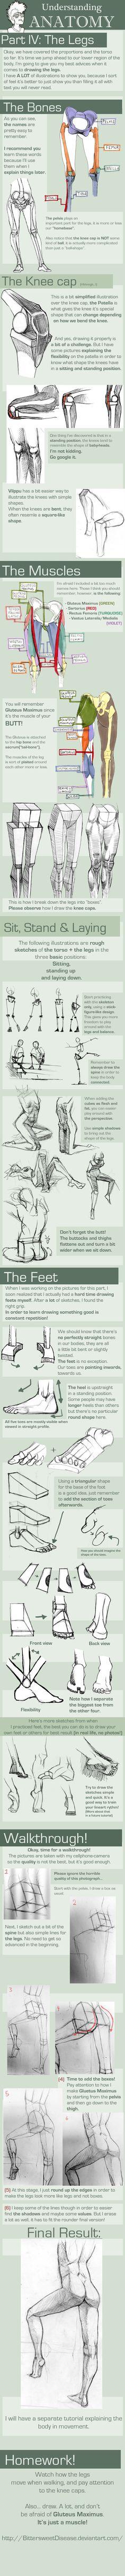 Understanding anatomy - legs #Anatomytutorial